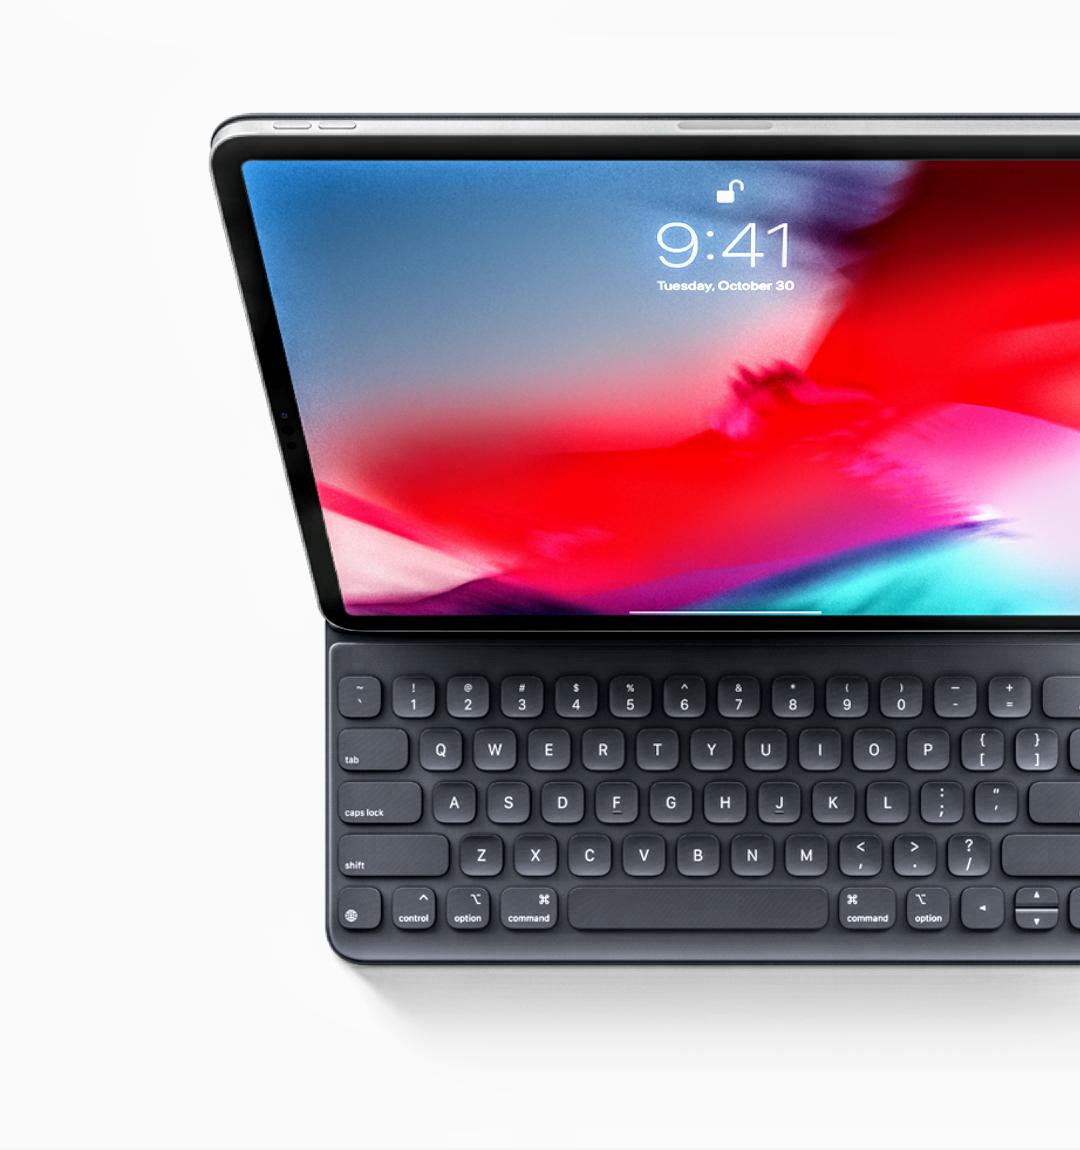 Best Accessories for Apple iPad Pro 2018 3. Smart Folio Keyboard